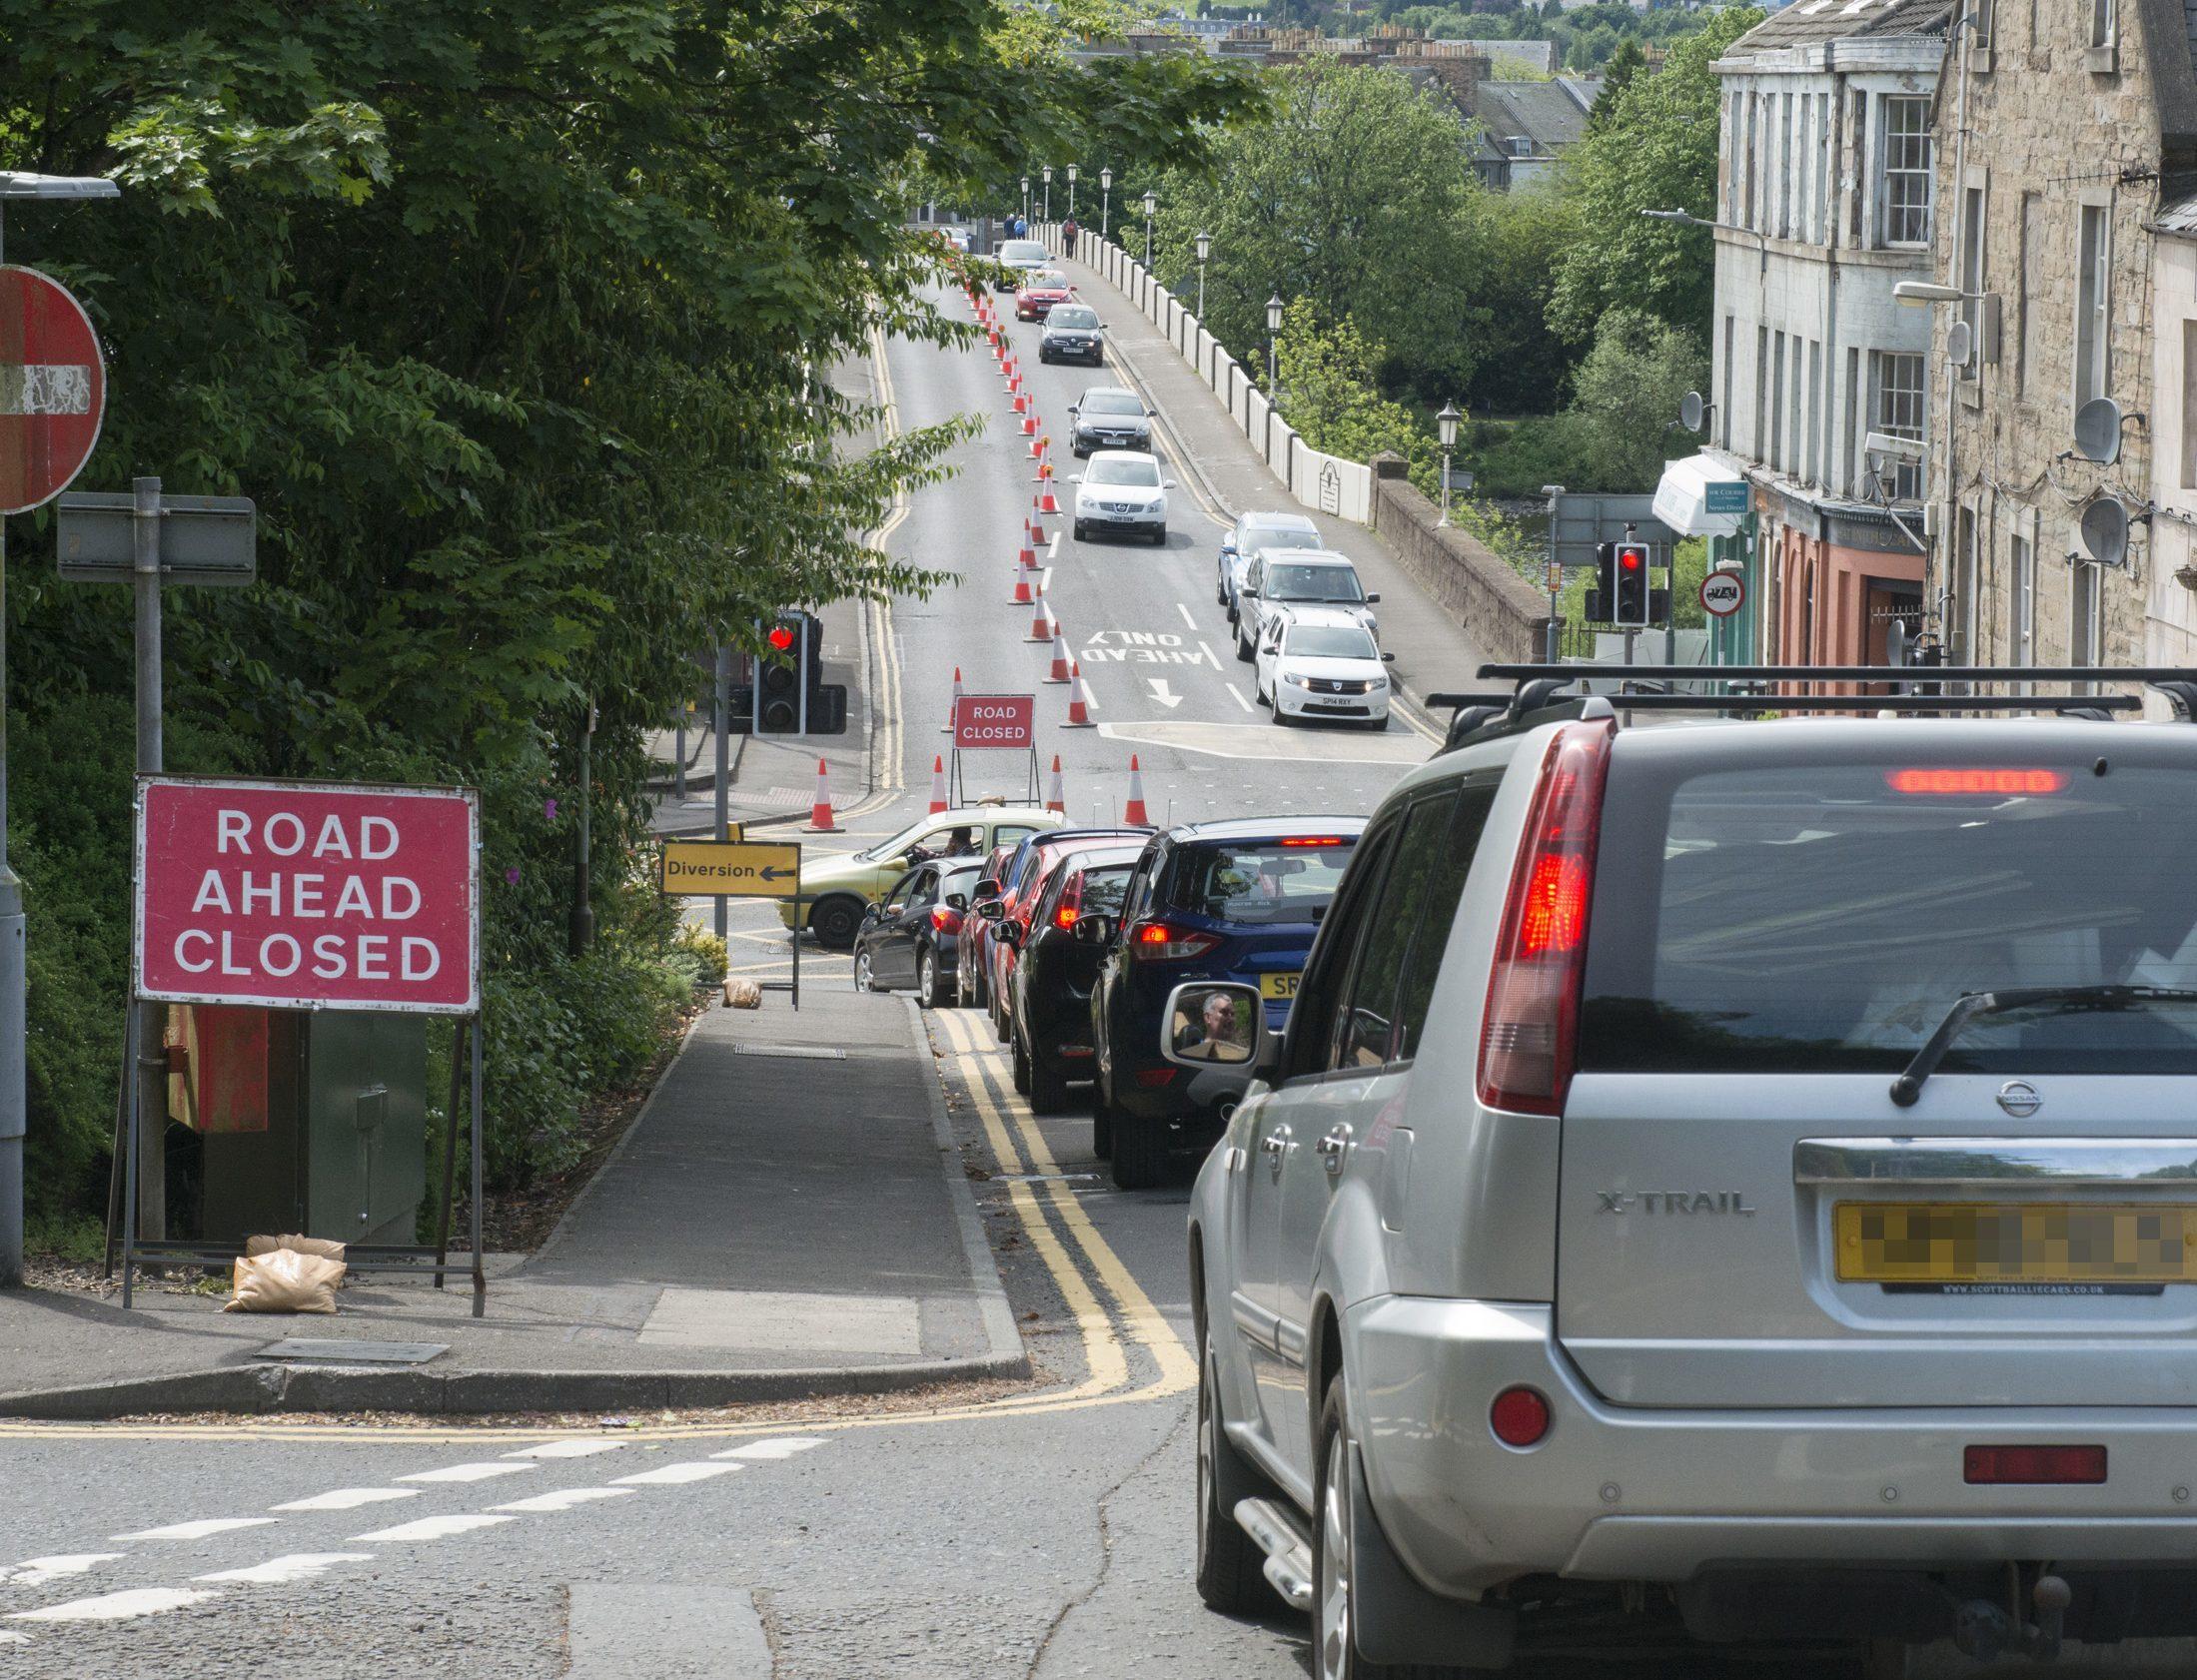 The phantom lane closure which caused the tailbacks.